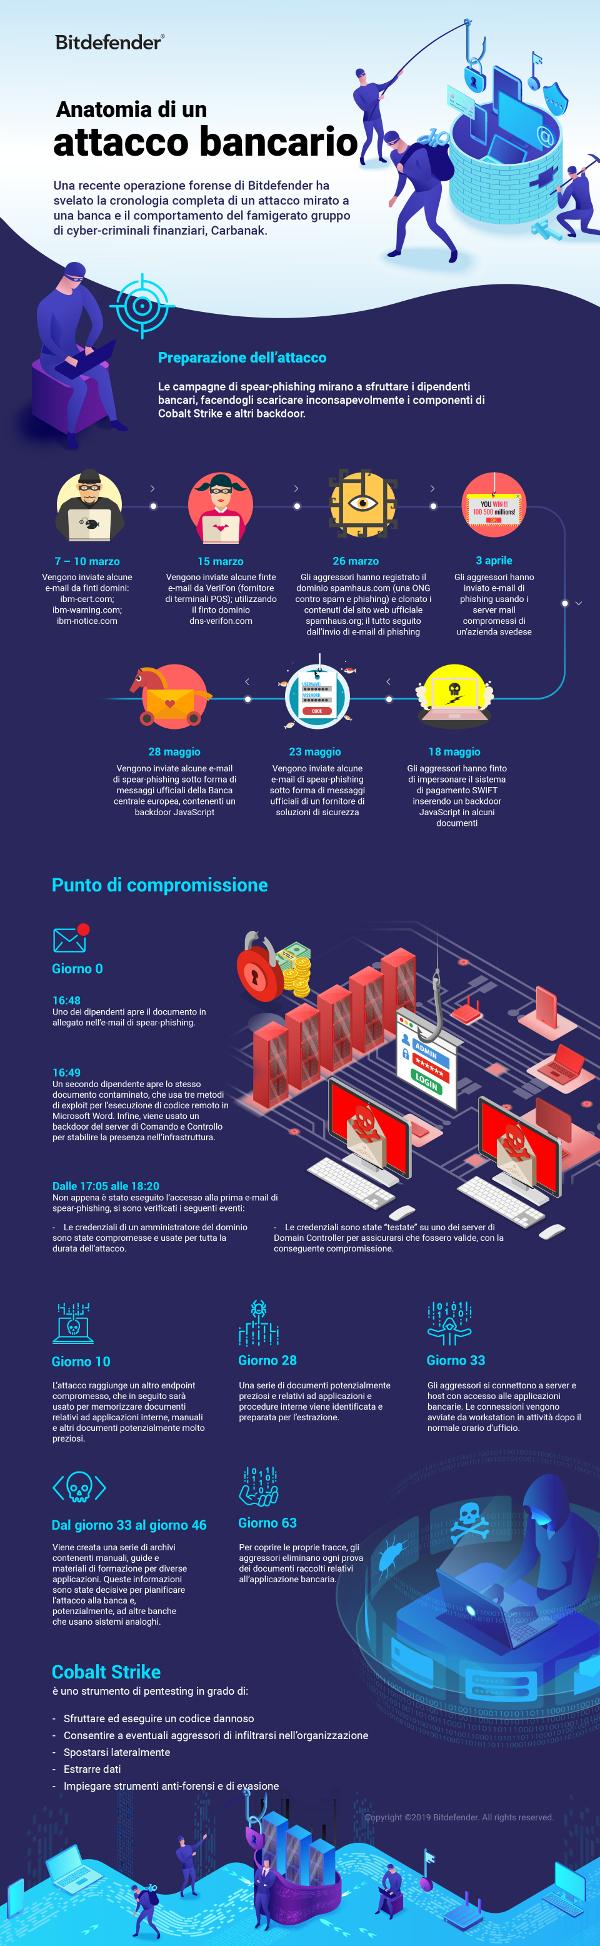 Carabanak-infographic-Anatomy_of_a_bank_attack